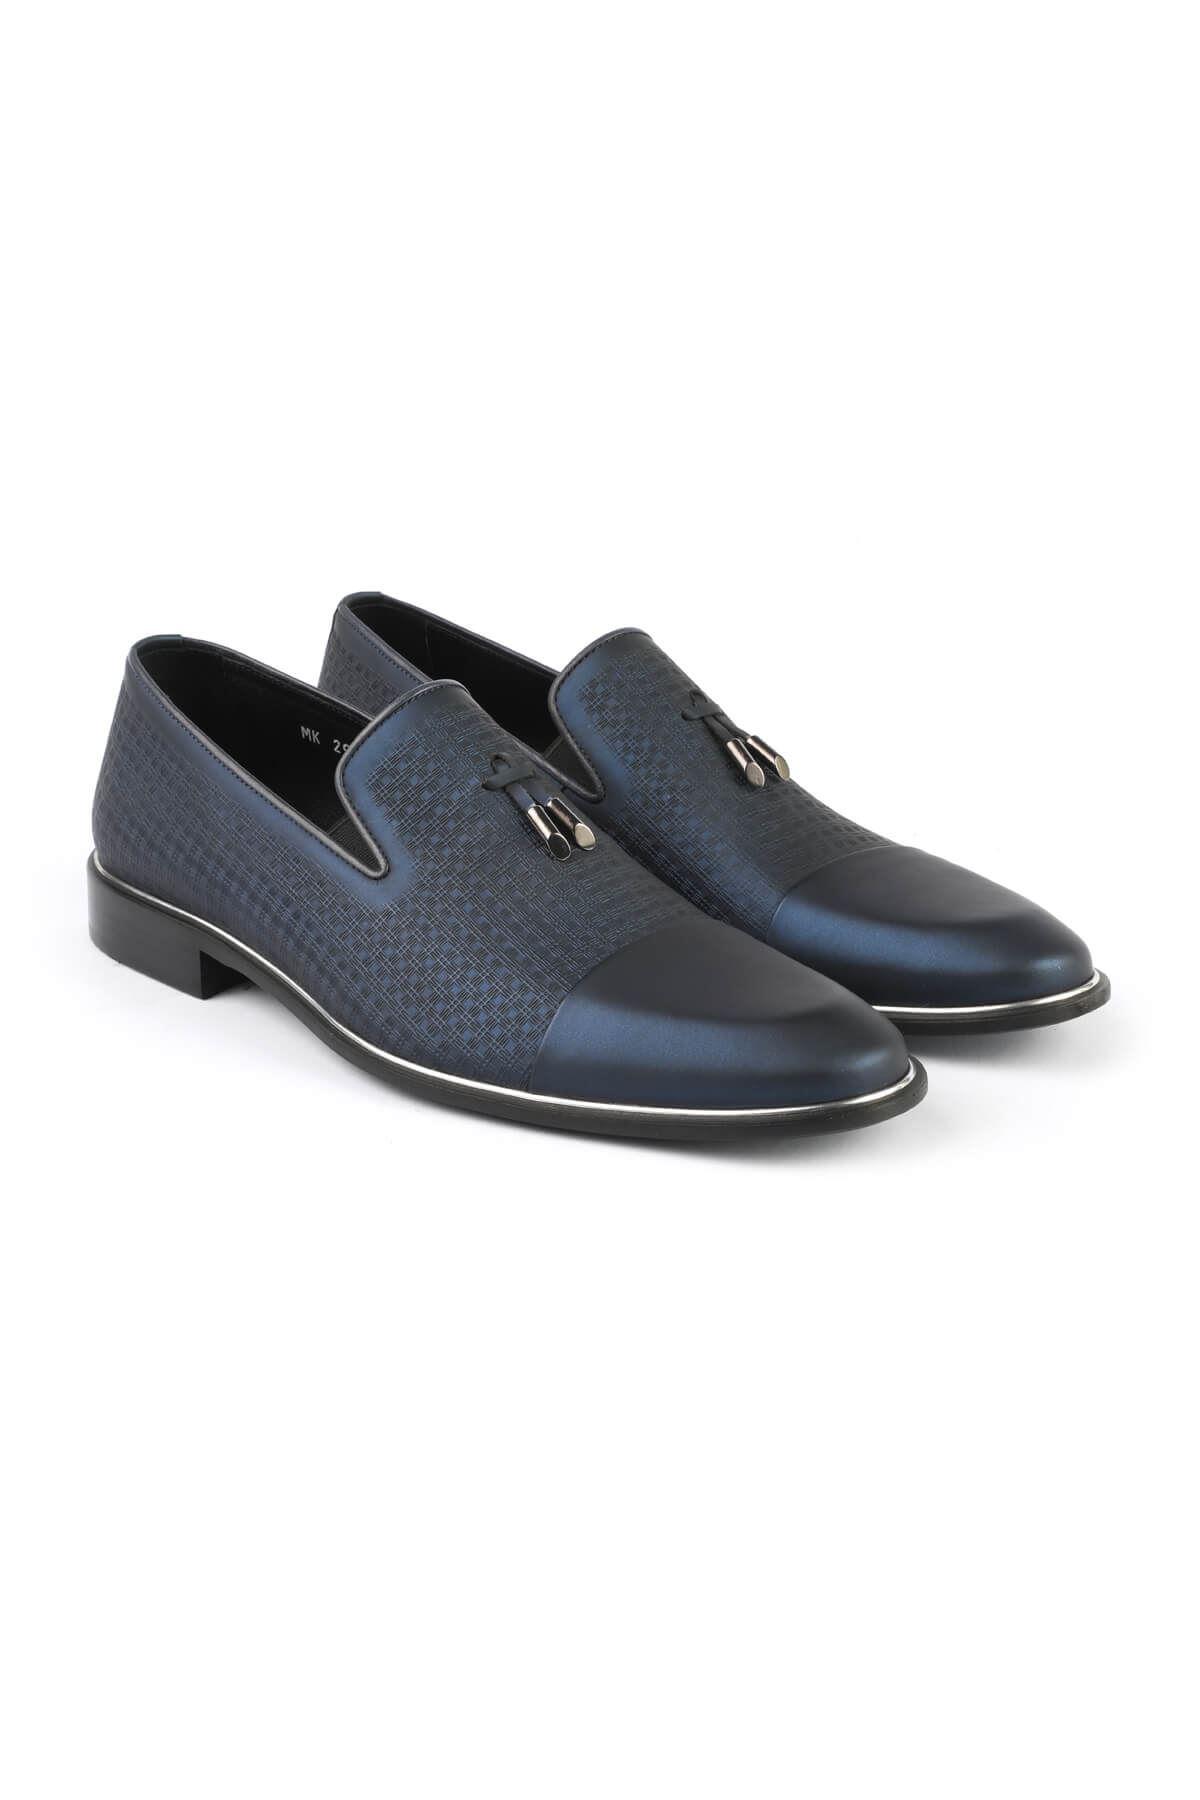 Libero 2989 Navy Blue Classic Shoes